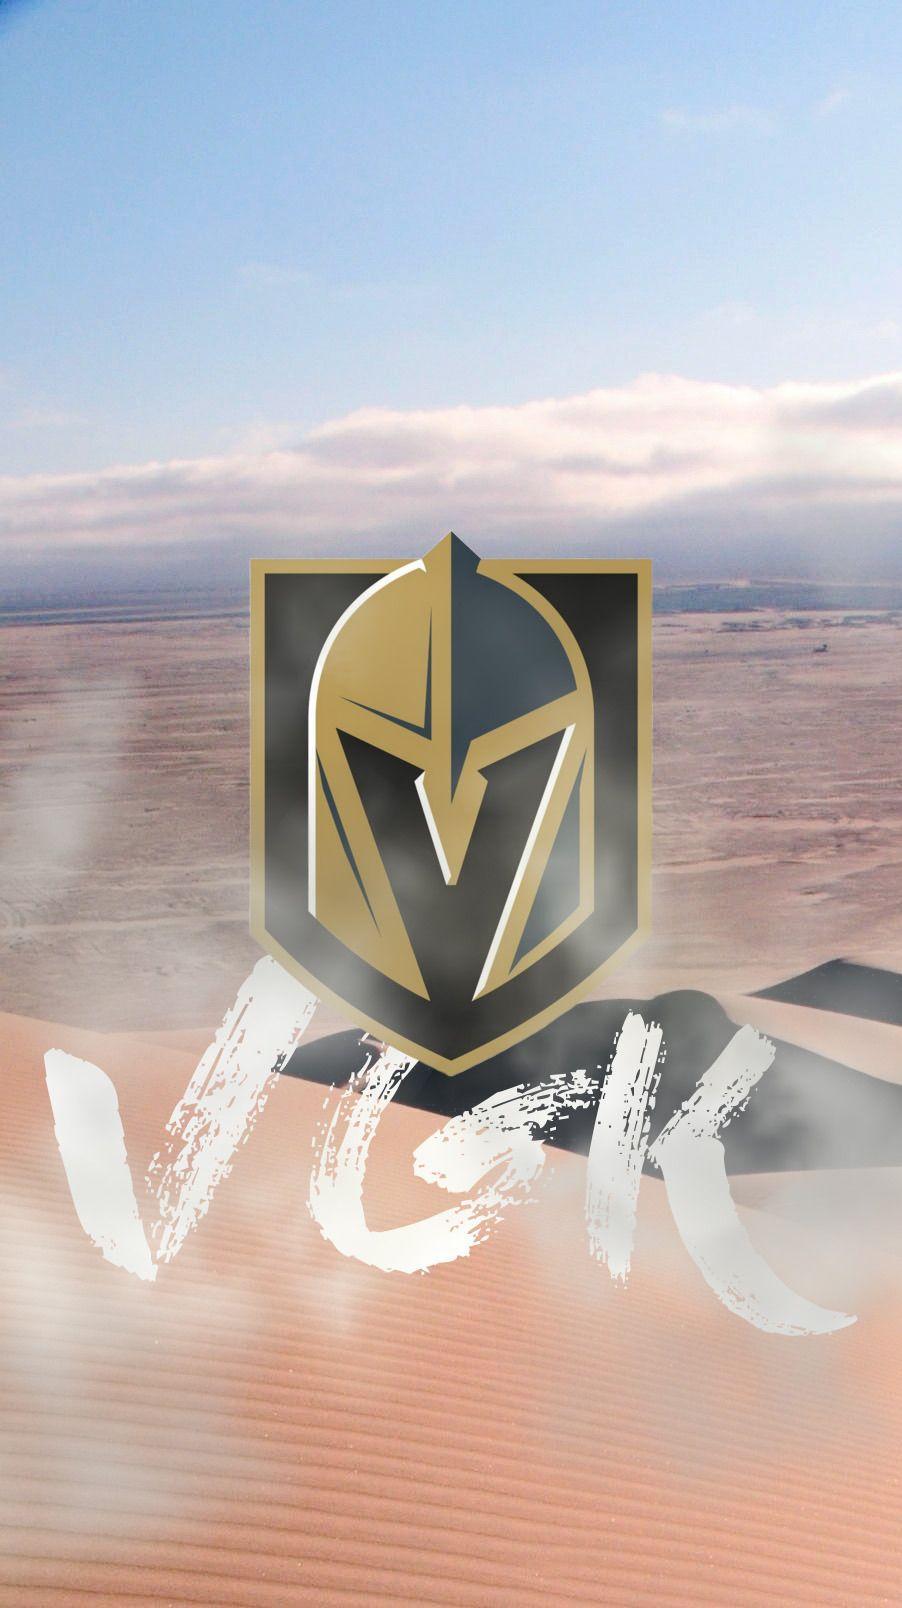 Las Vegas 94 >> Vegas Golden Knights Wallpapers - Wallpaper Cave